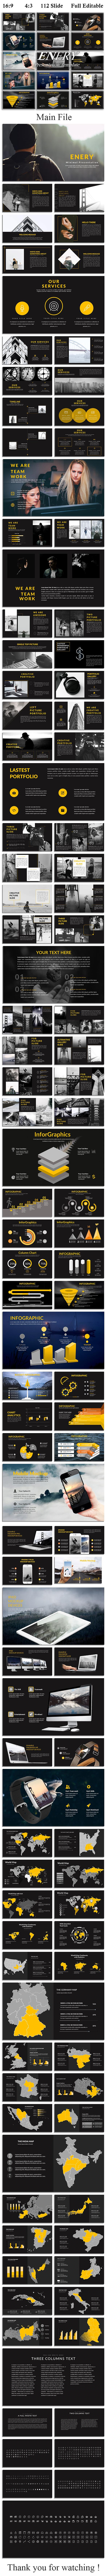 Enery - Creative Google Slide Template - Google Slides Presentation Templates